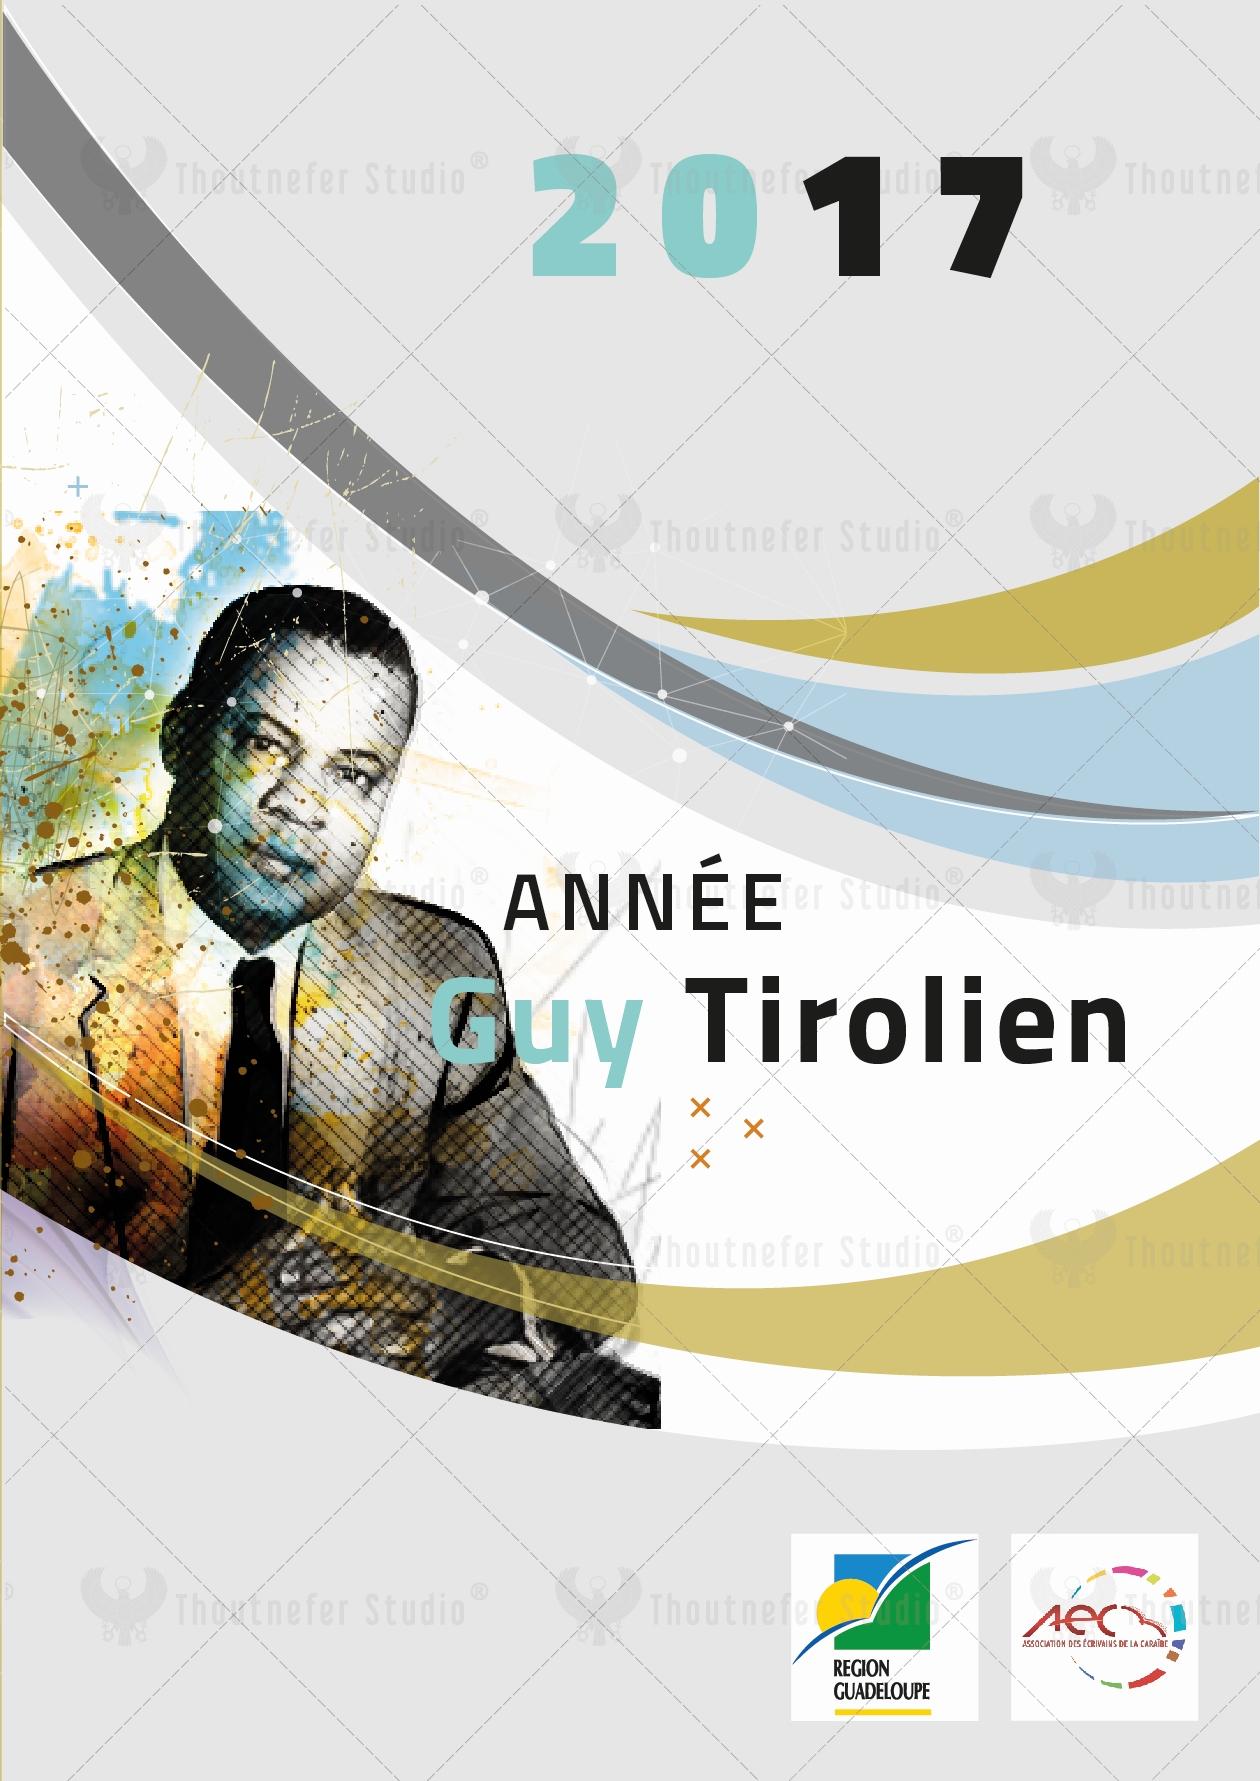 Programme de l'année Guy Tirolien